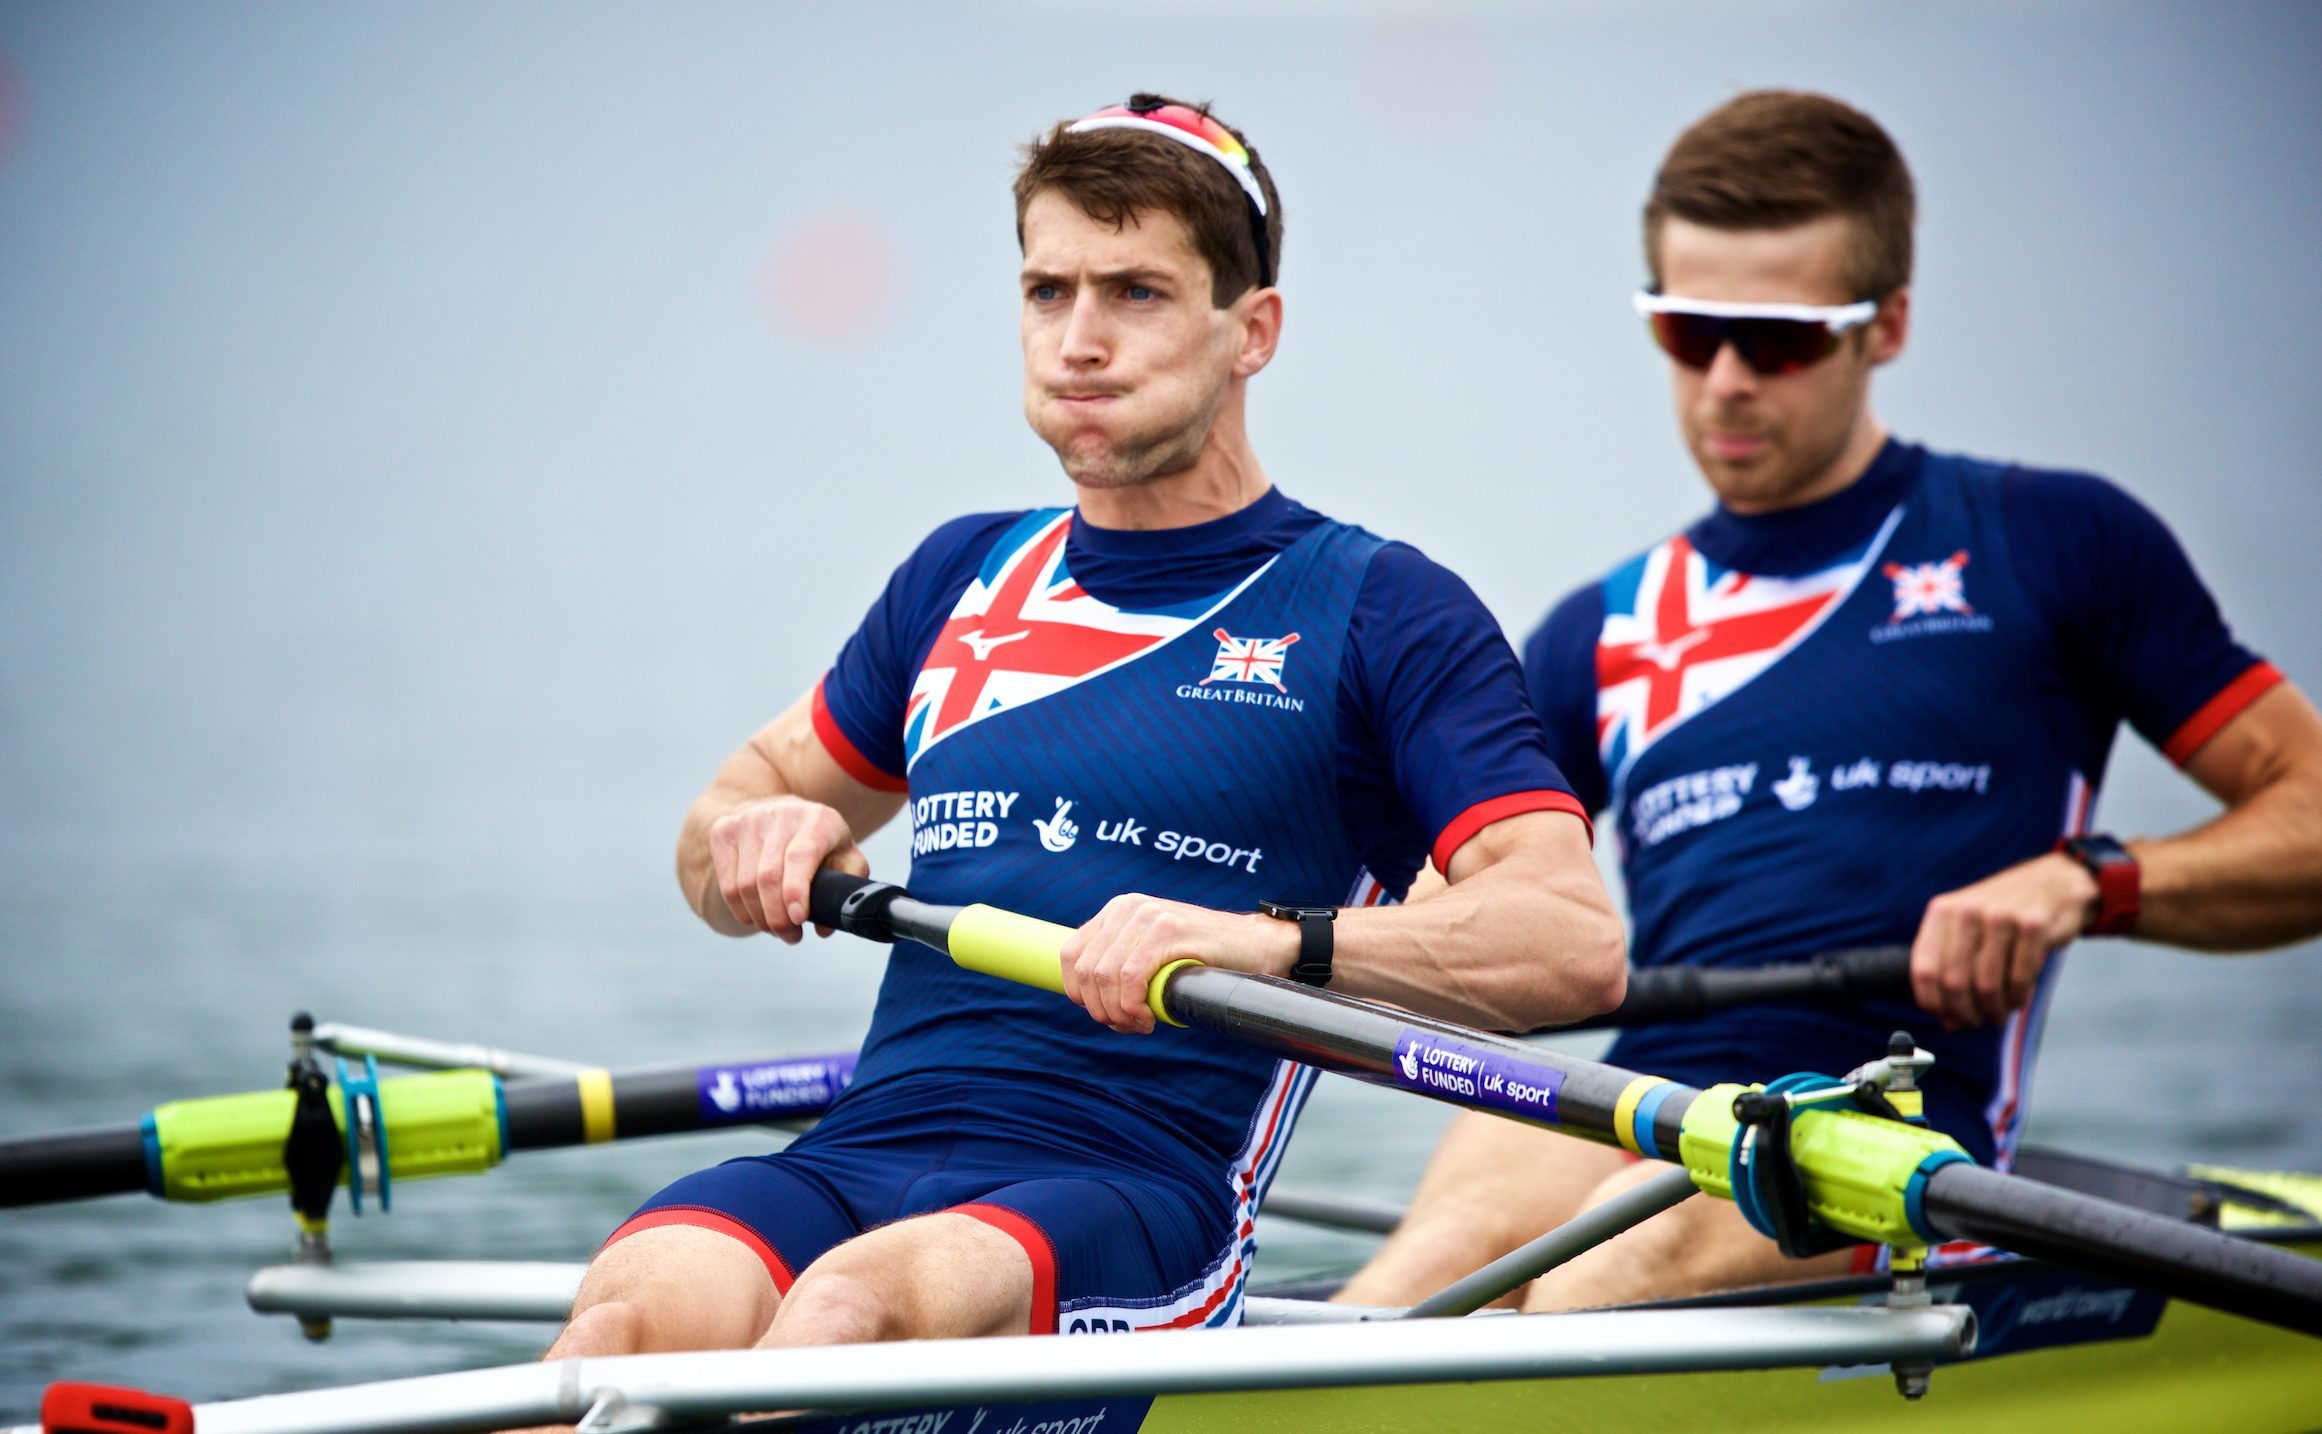 Sam Scrimgeour (left) with rowing partner Joel Cassells.